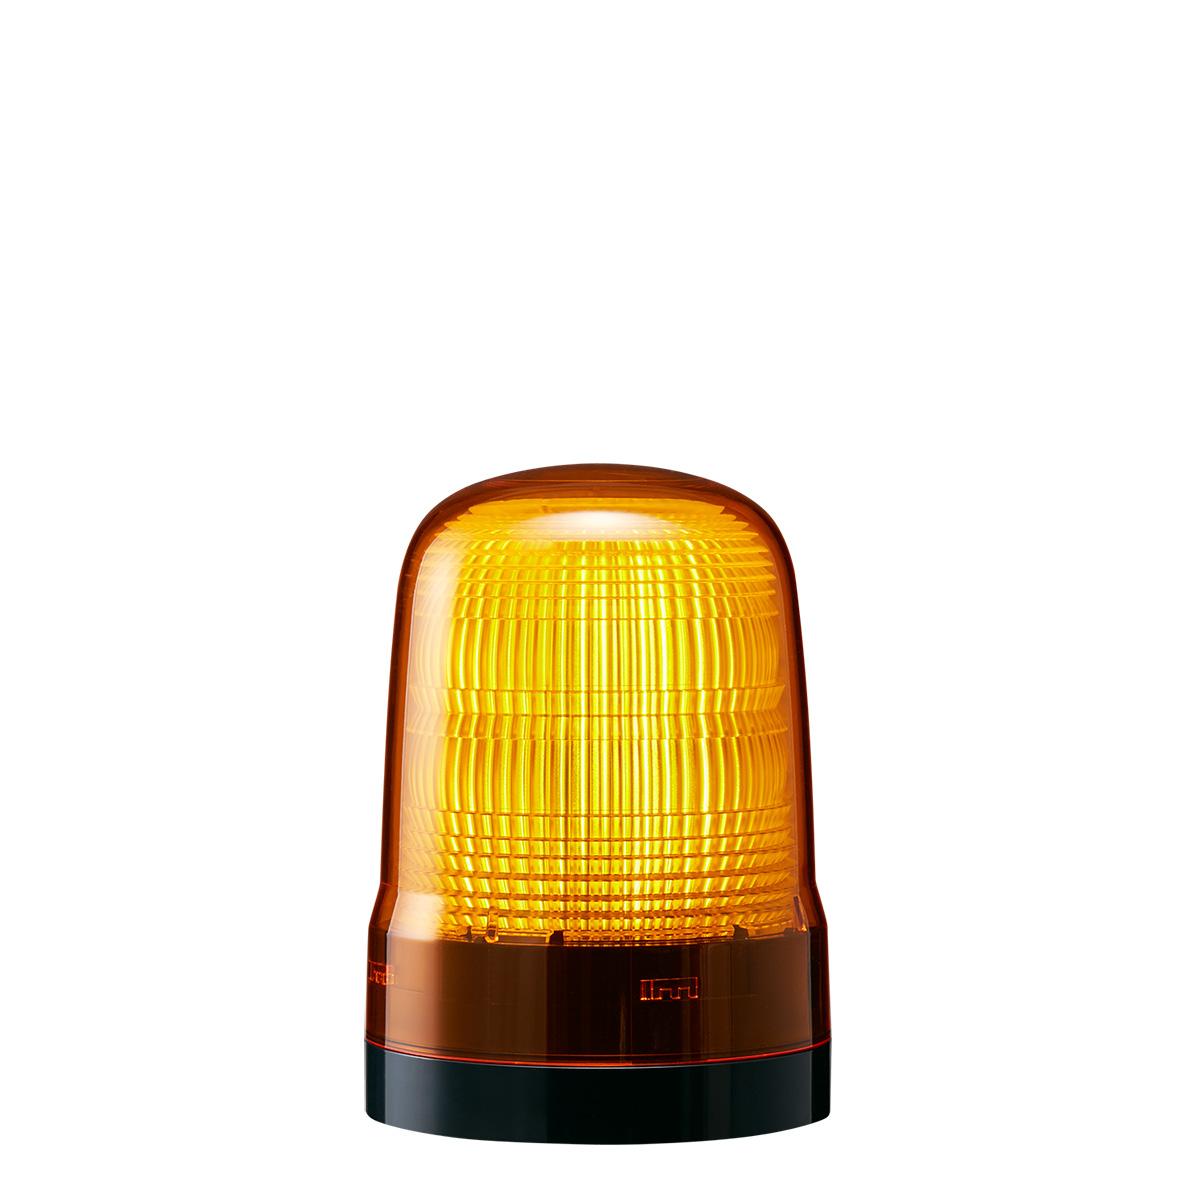 <title>送料無料 点灯 点滅 フラッシュのシンプル報知 黄色灯 パトライト LED表示灯 SL DC12~24V 2.9W φ100mm イエロー 黄色 プッシュイン端子台 限定モデル 2点穴取付 SL10-M1KTN-Y</title>